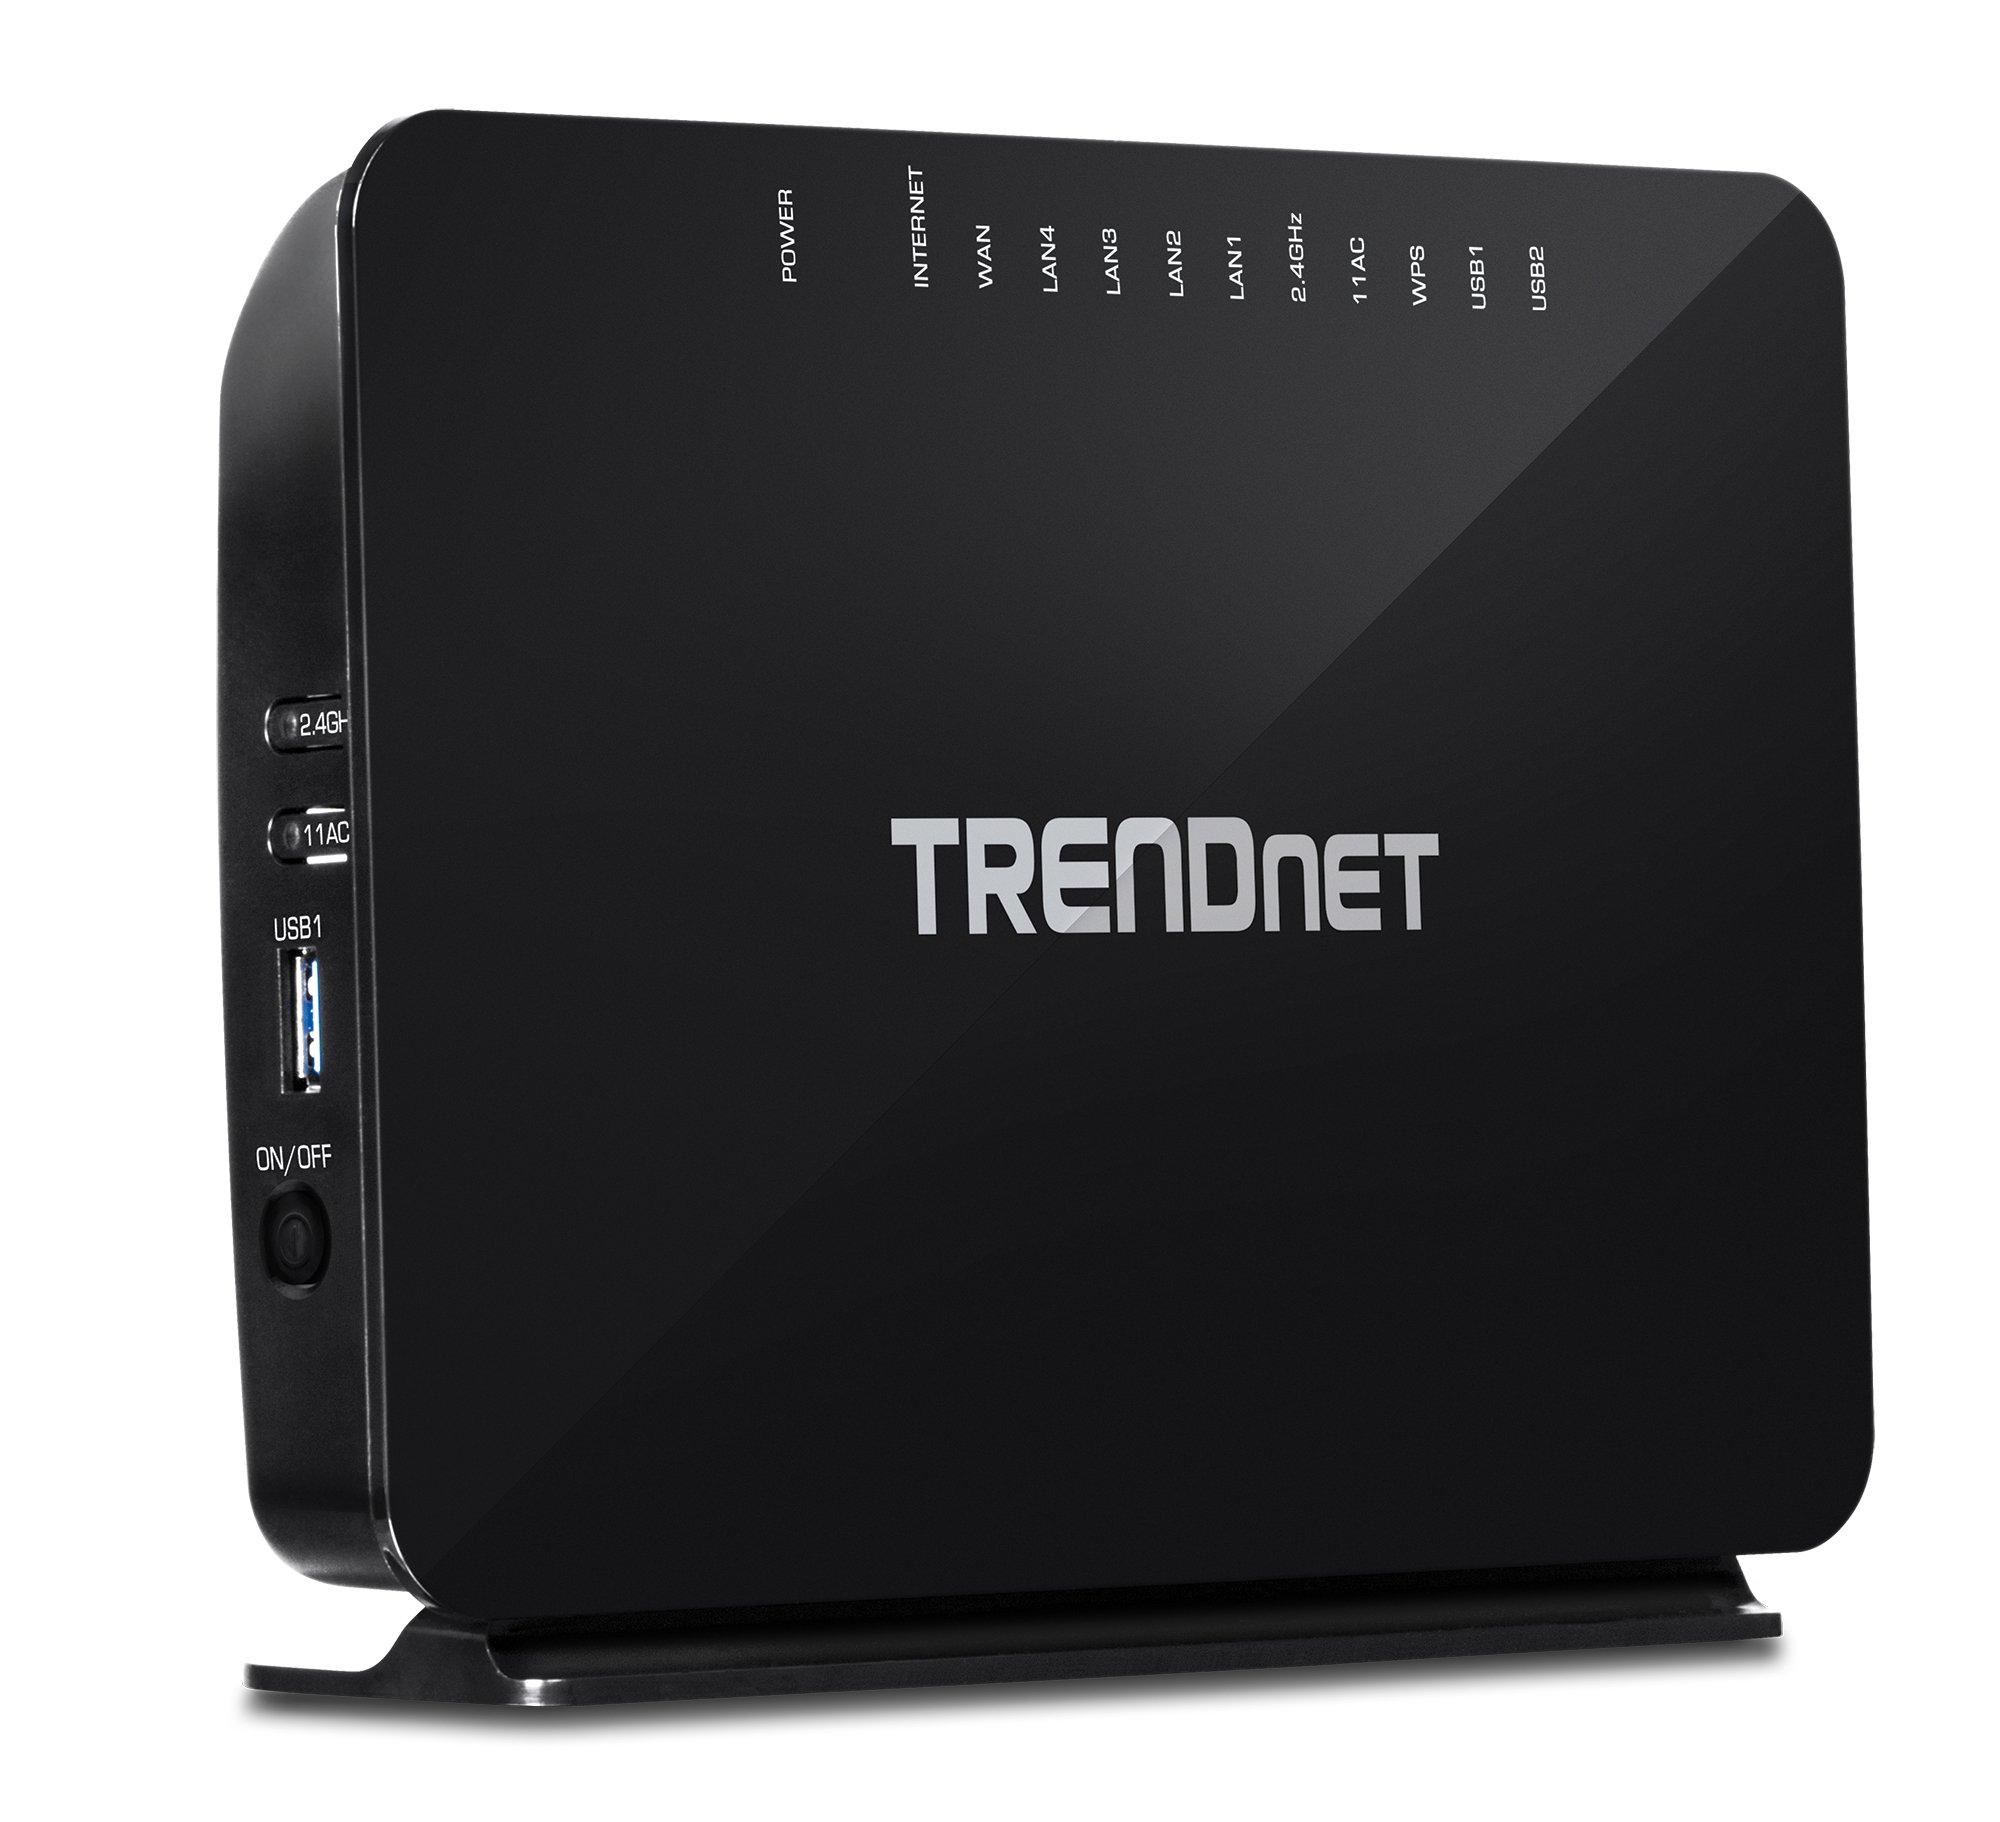 TRENDnet AC750 Wireless VDSL2/ADSL2+ Modem Router, 200 Mbps VDSL Downstream Speeds, USB share ports, TEW-816DRM by TRENDnet